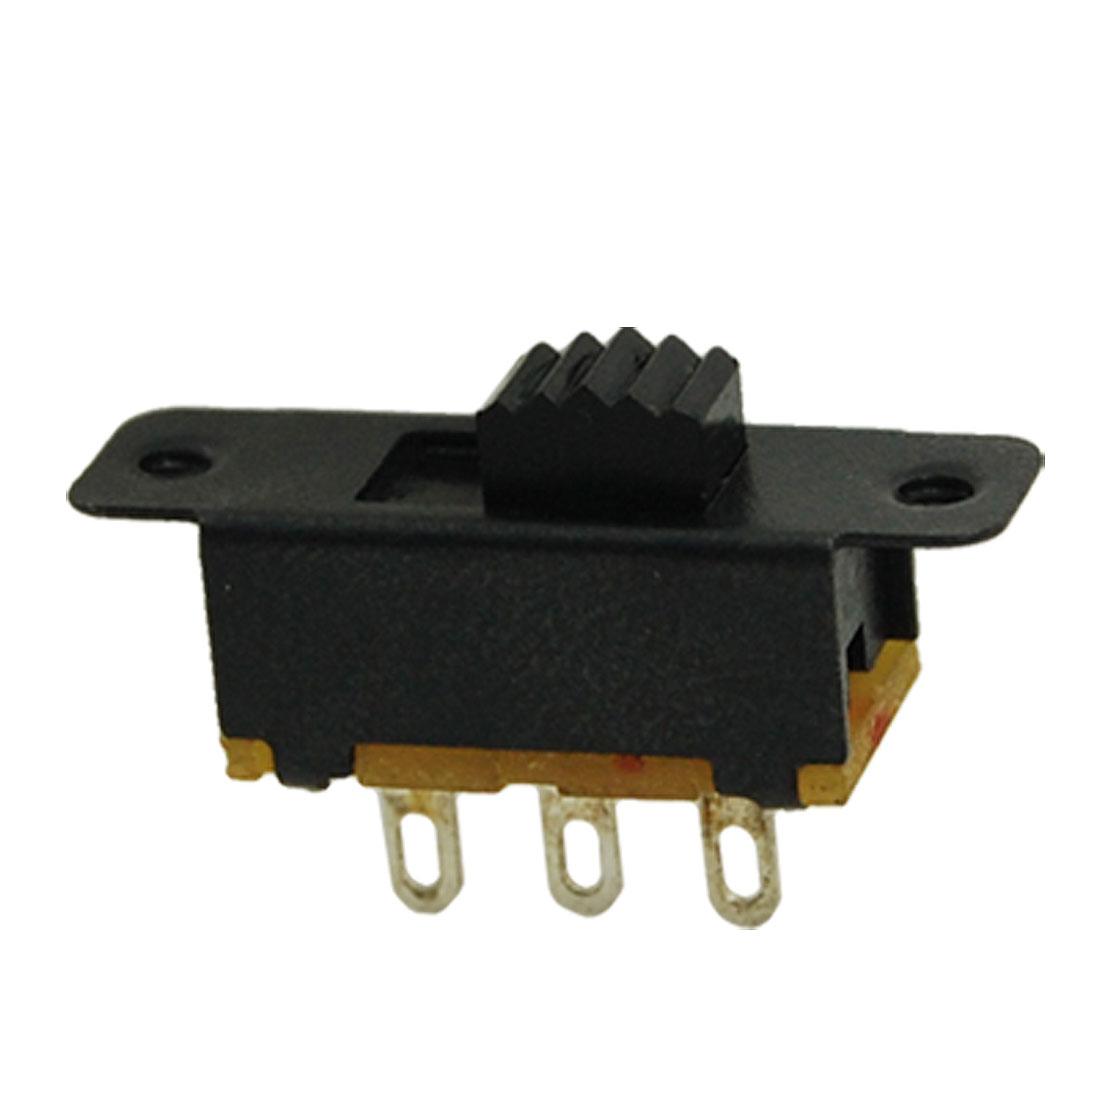 10 Pcs 3mm Height Knob 3 Pin 2 Position 1P2T SPDT Panel Slide Switch 0.5A 50V DC